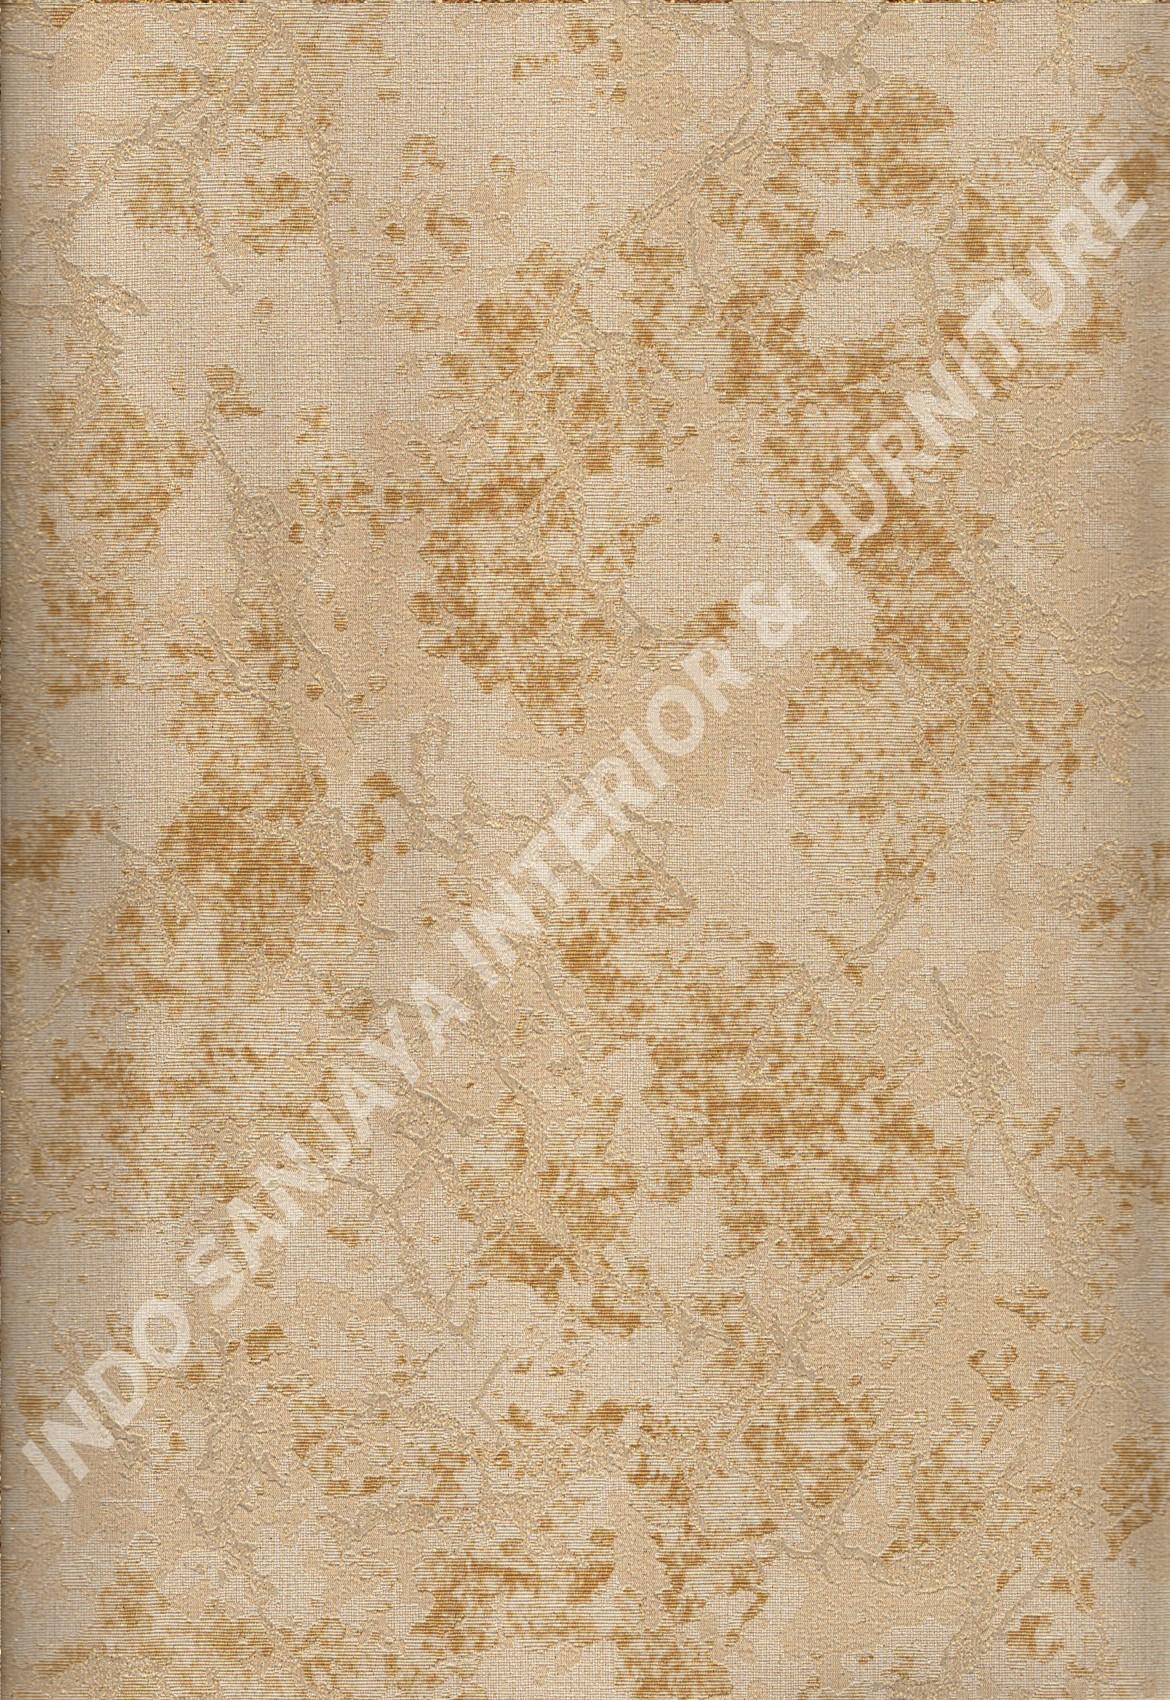 wallpaper   Wallpaper Minimalis Polos 81124-:81124- corak  warna